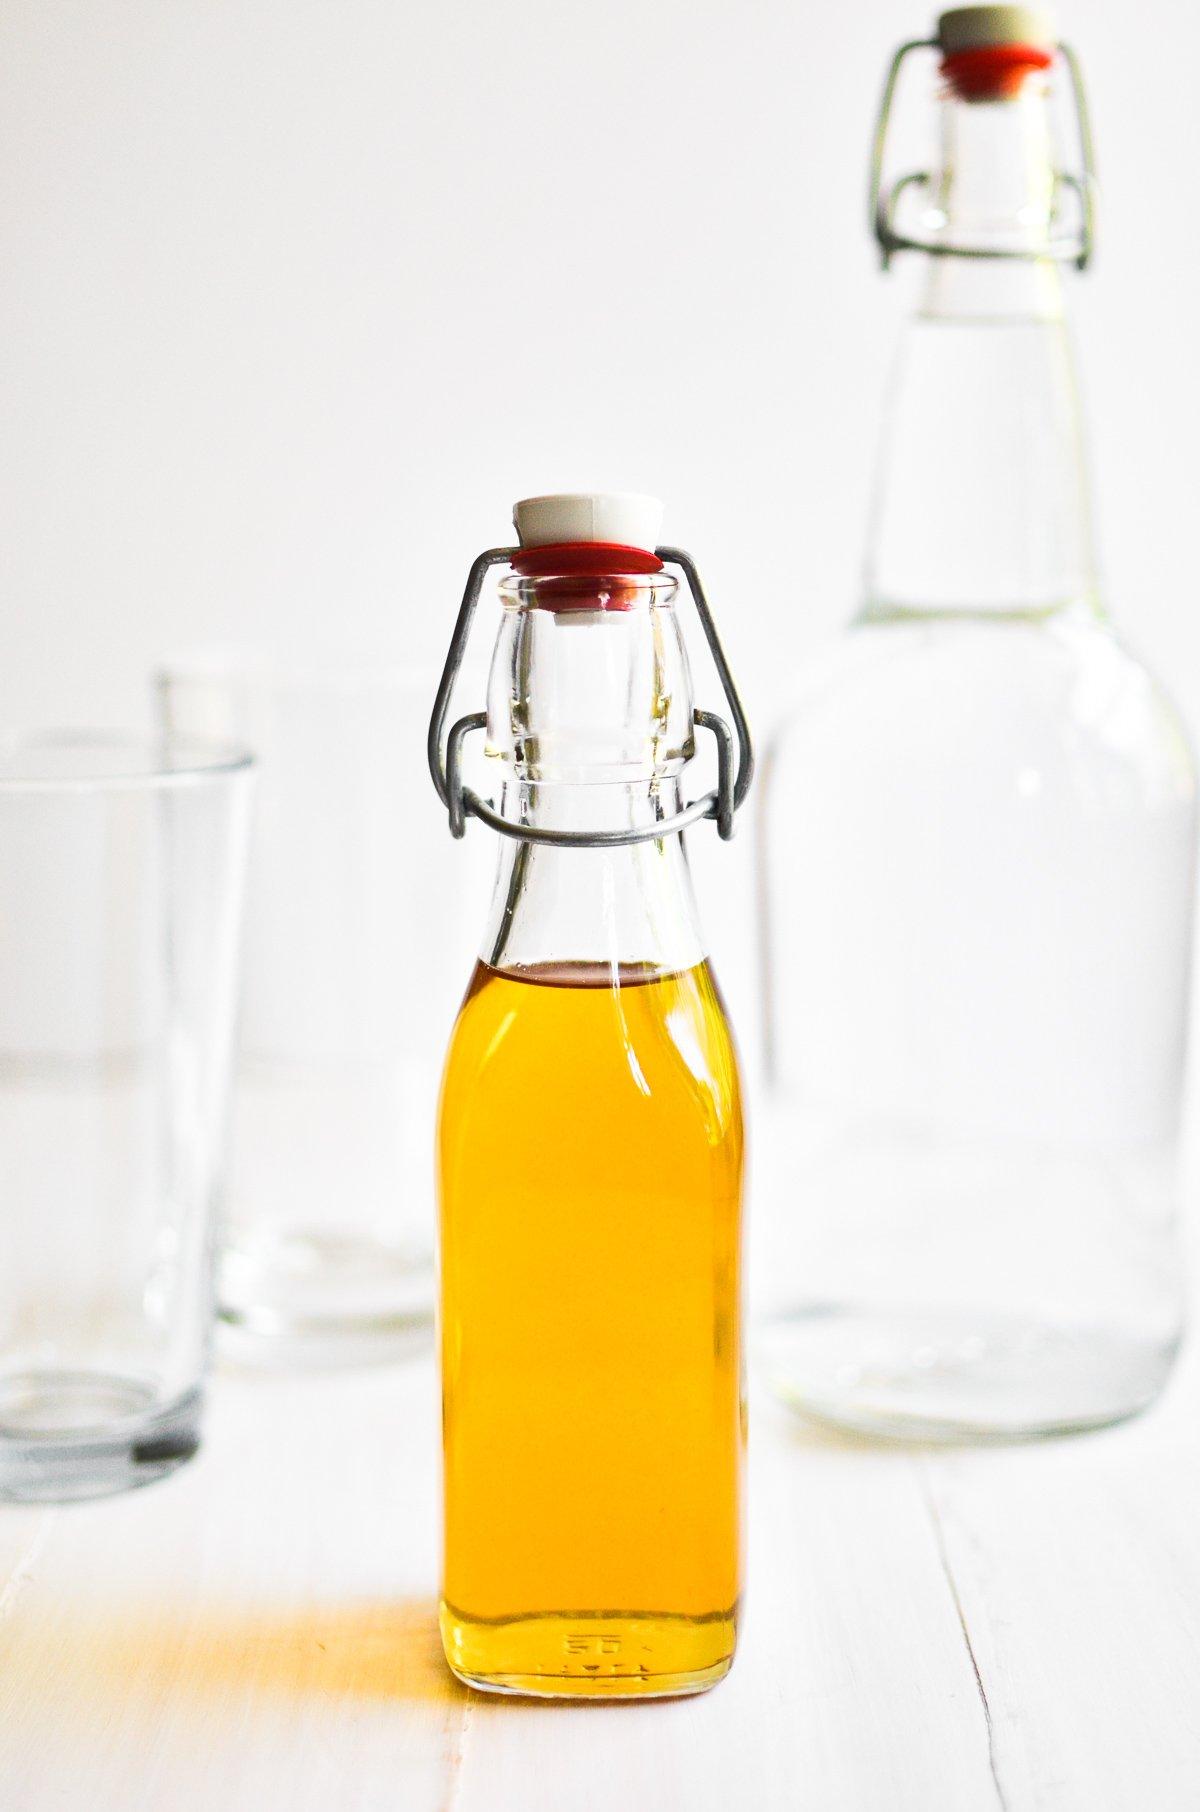 vanilla sugar syrup in a bottle